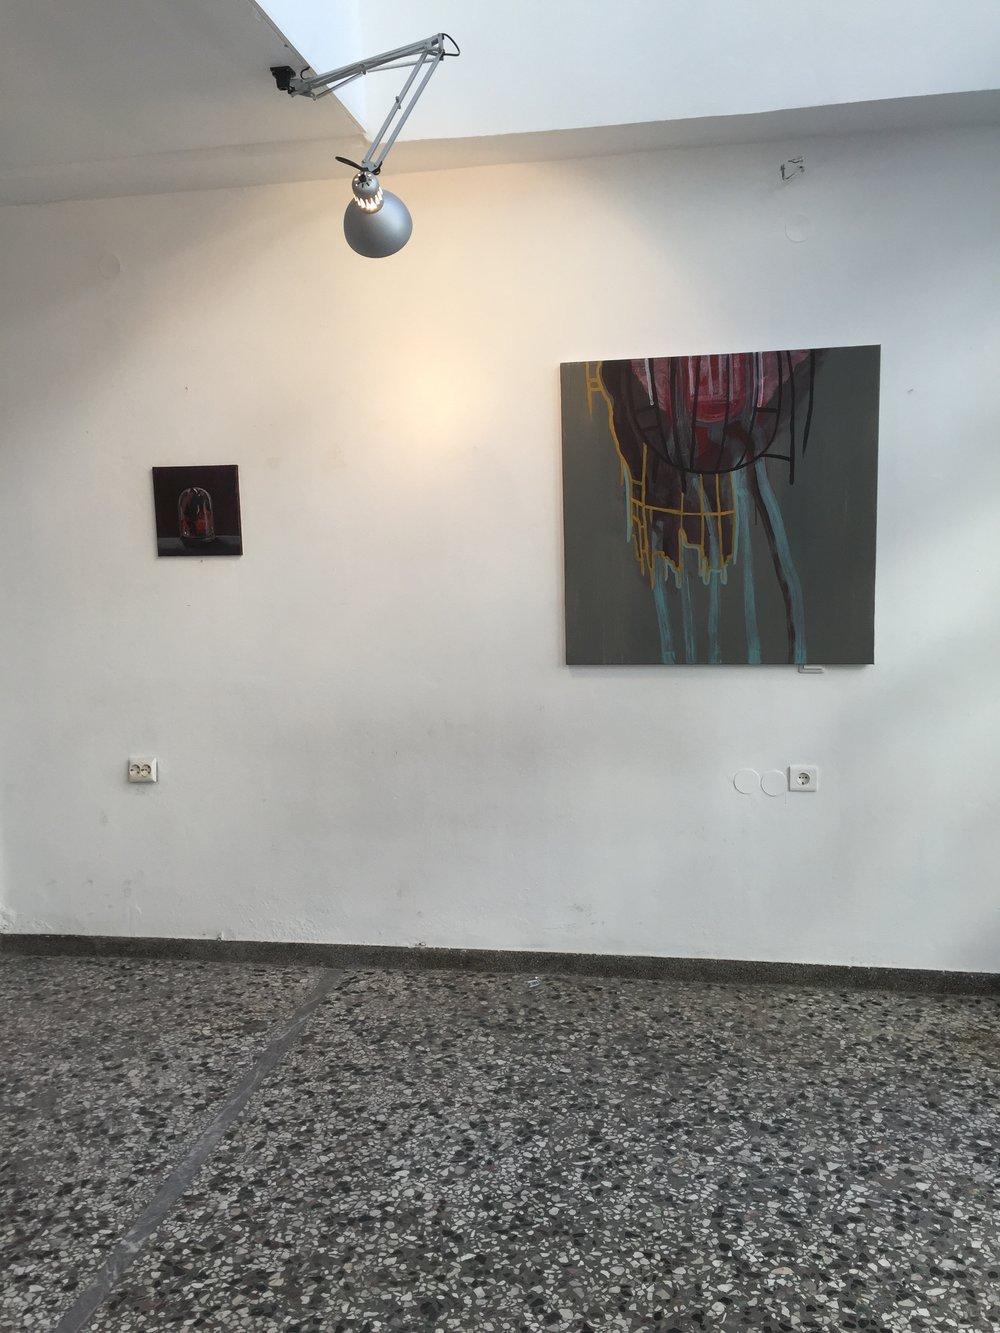 Clytemnestra never loved you, Da Gallery, Heraklion, Greece 2016